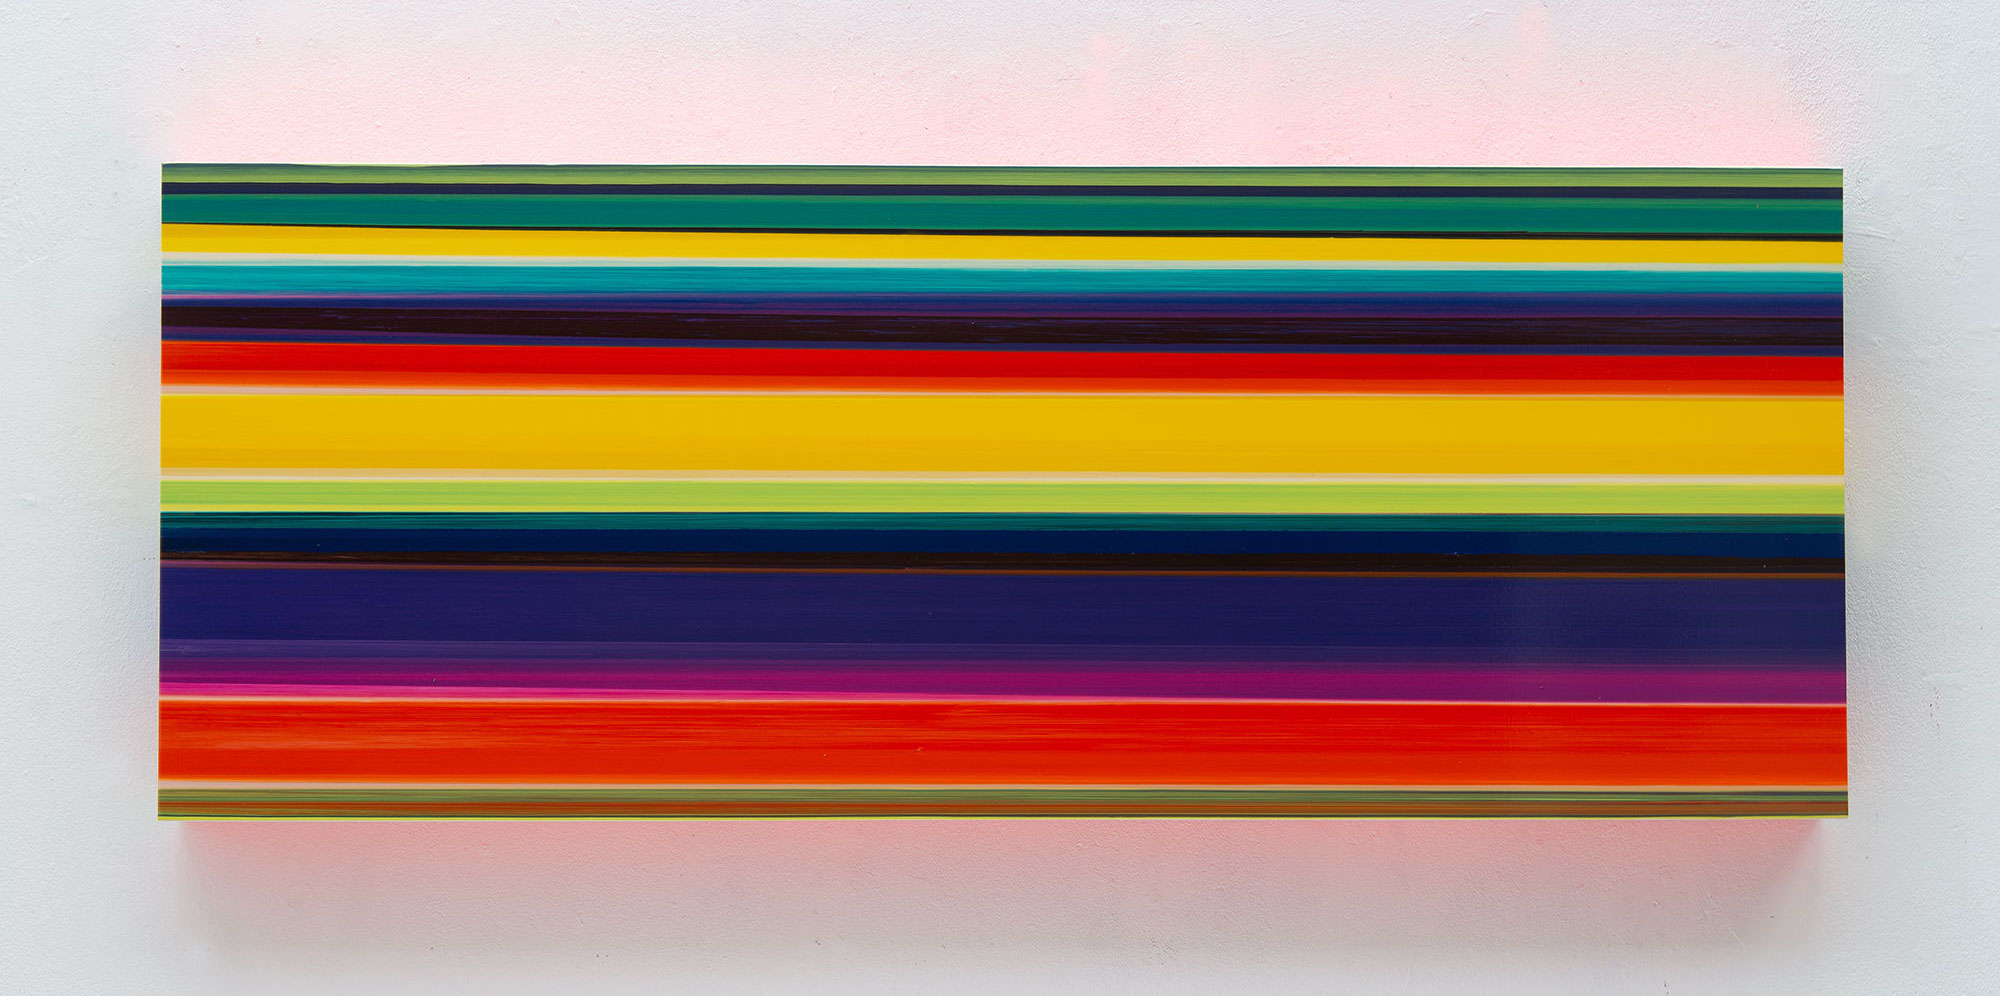 Technicolor Panorama Orba - 70 x 180 x 12 cm - Thierry Feuz - Leonhard's Gallery